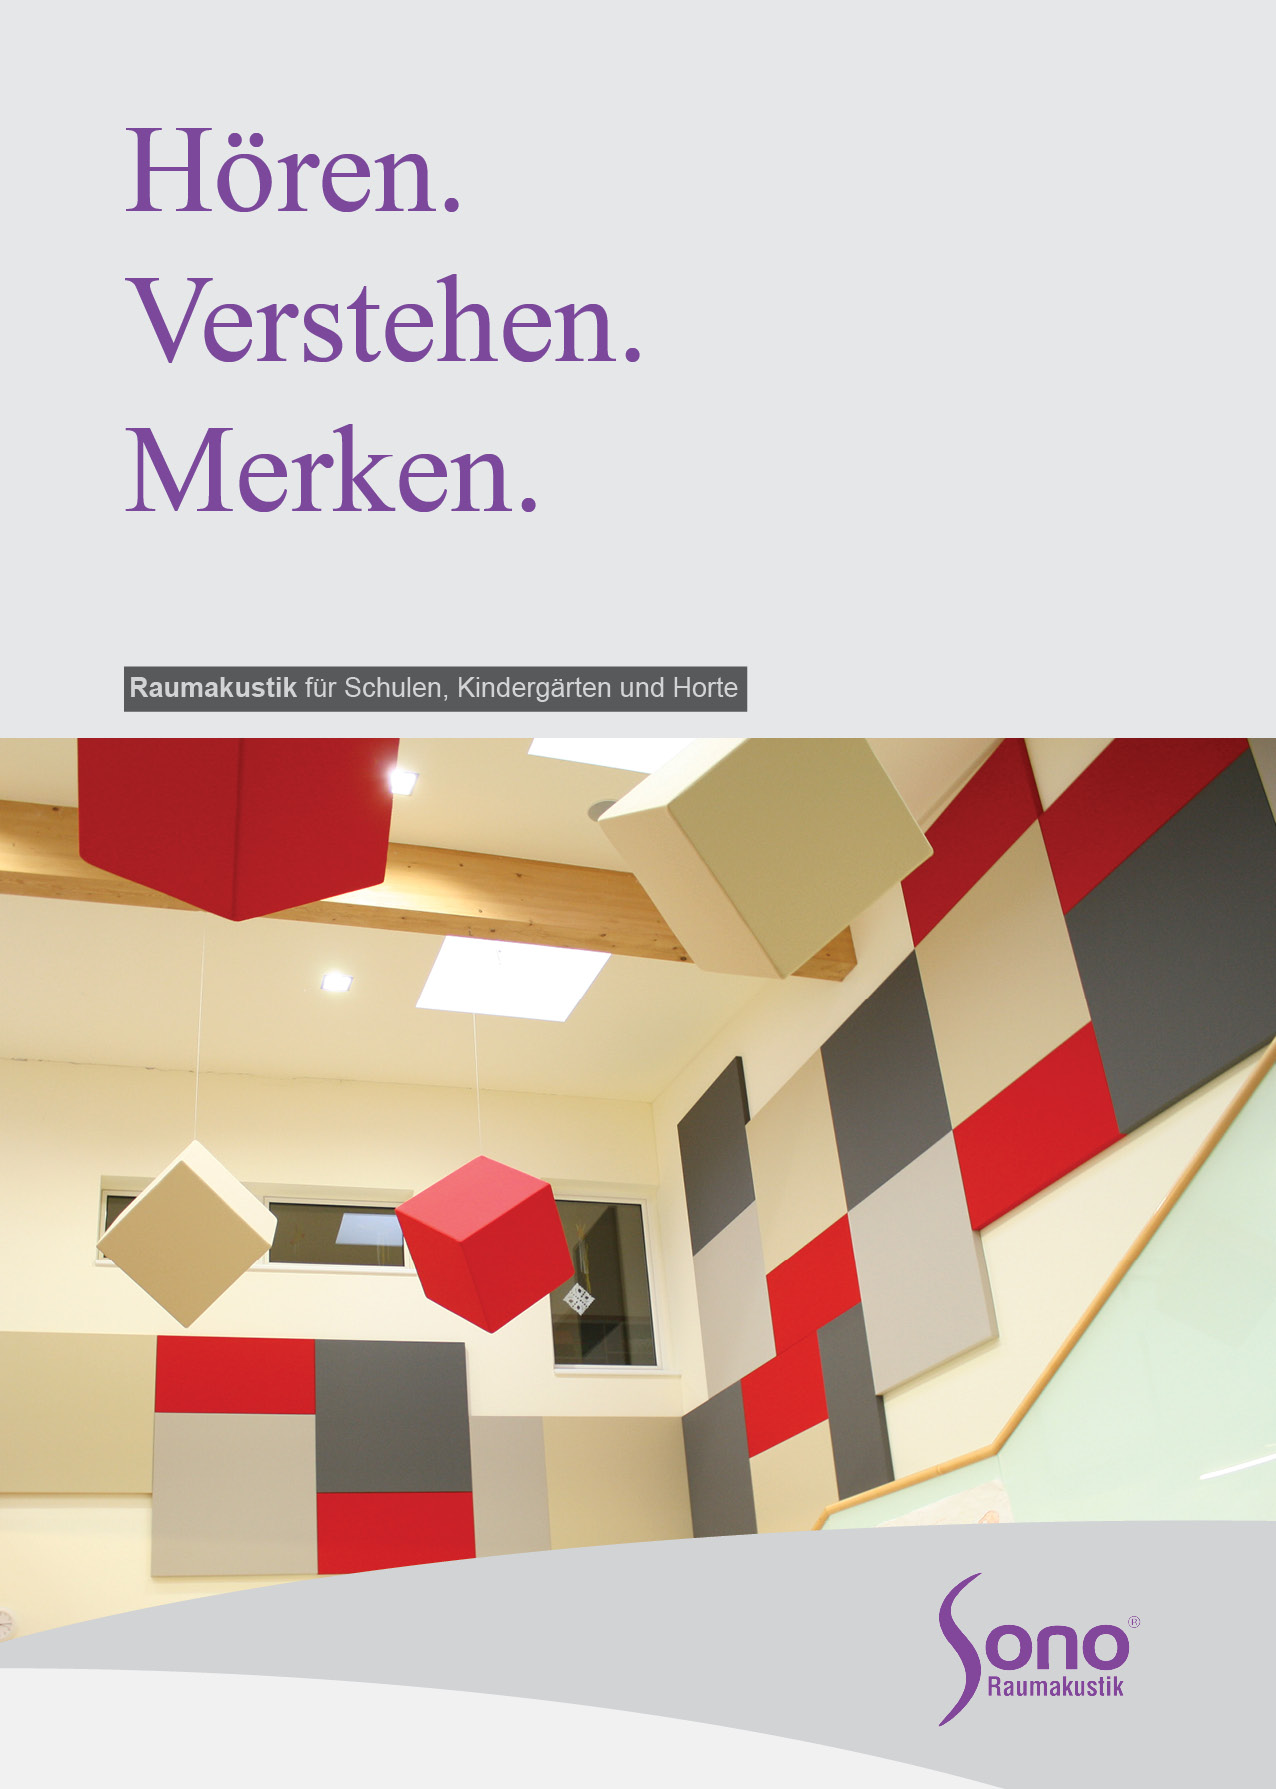 Folder_Hören-Verstehen-Merken_Schule-KIGA-Horte_2019_Titelseite